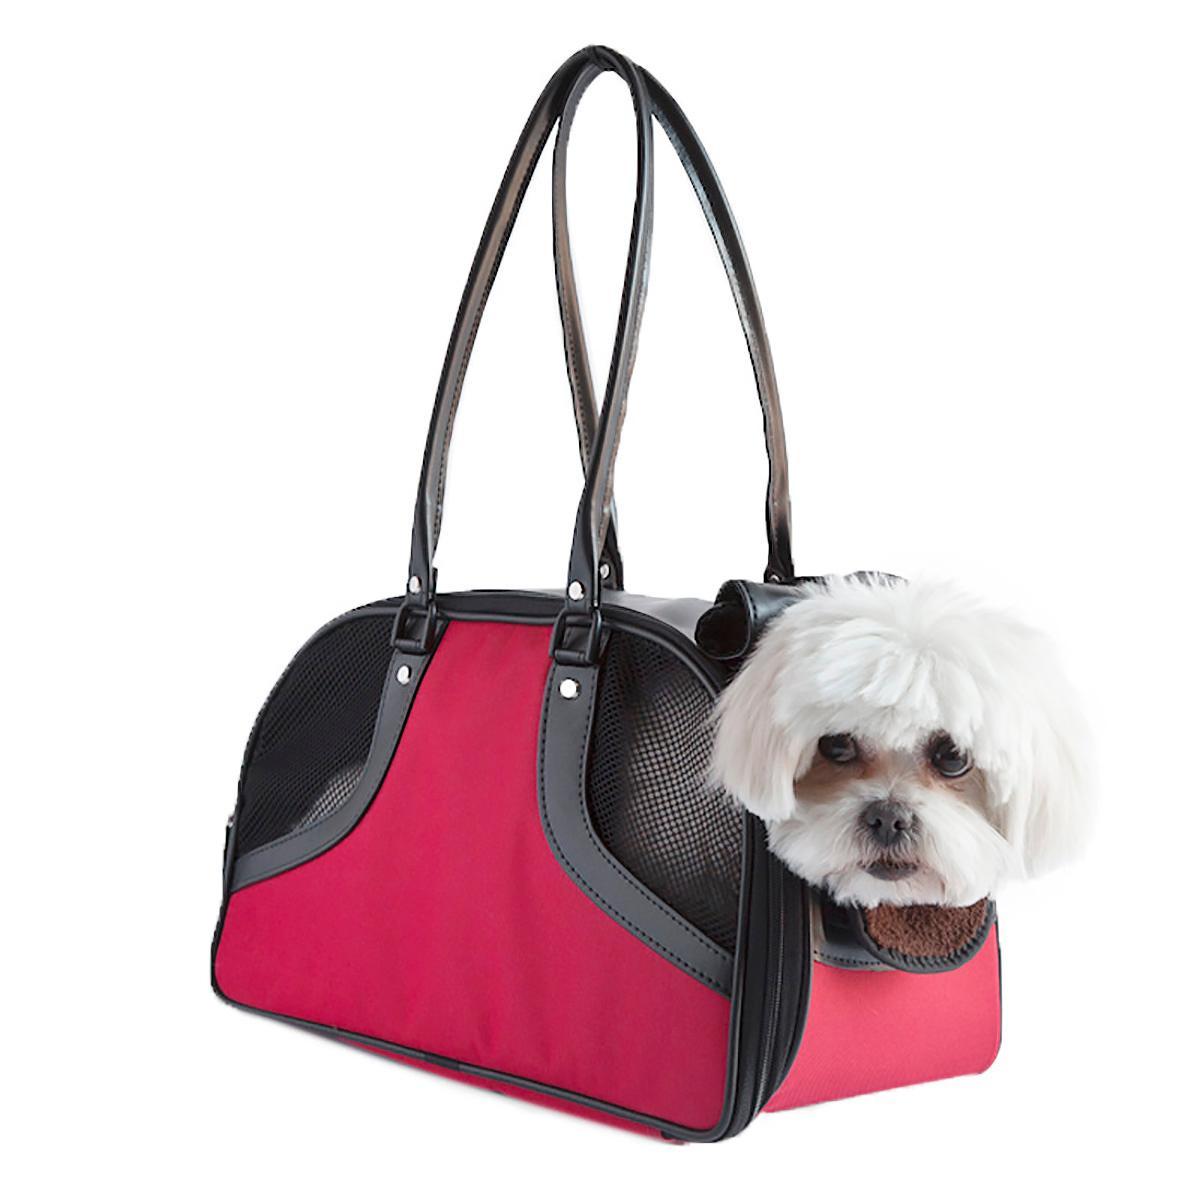 Petote Roxy Dog Carrier Handbag - Red